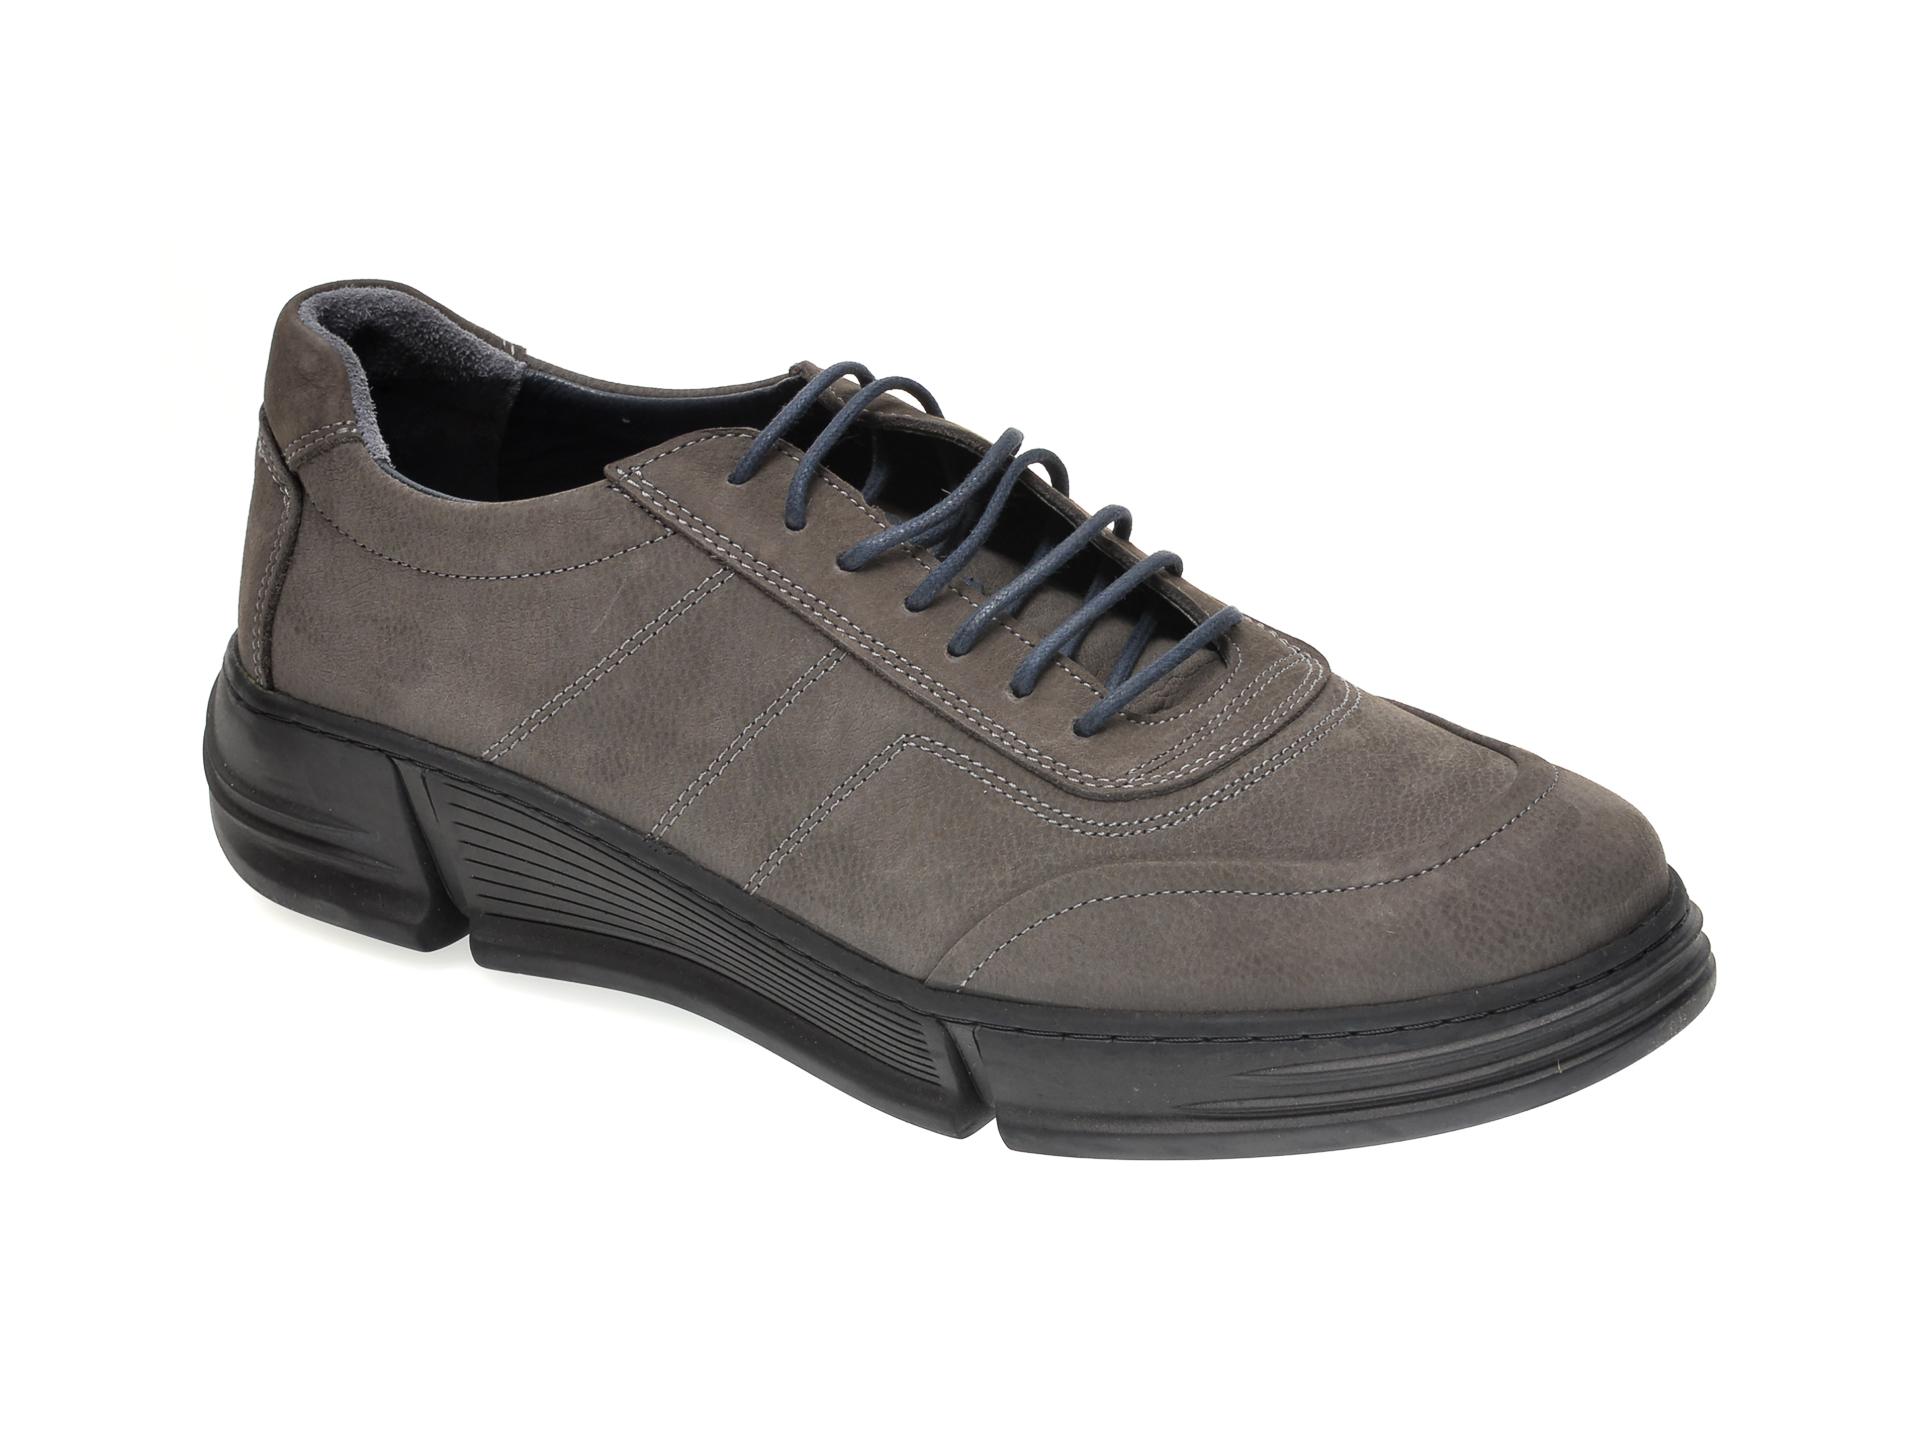 Pantofi OTTER gri, M5726, din nabuc New